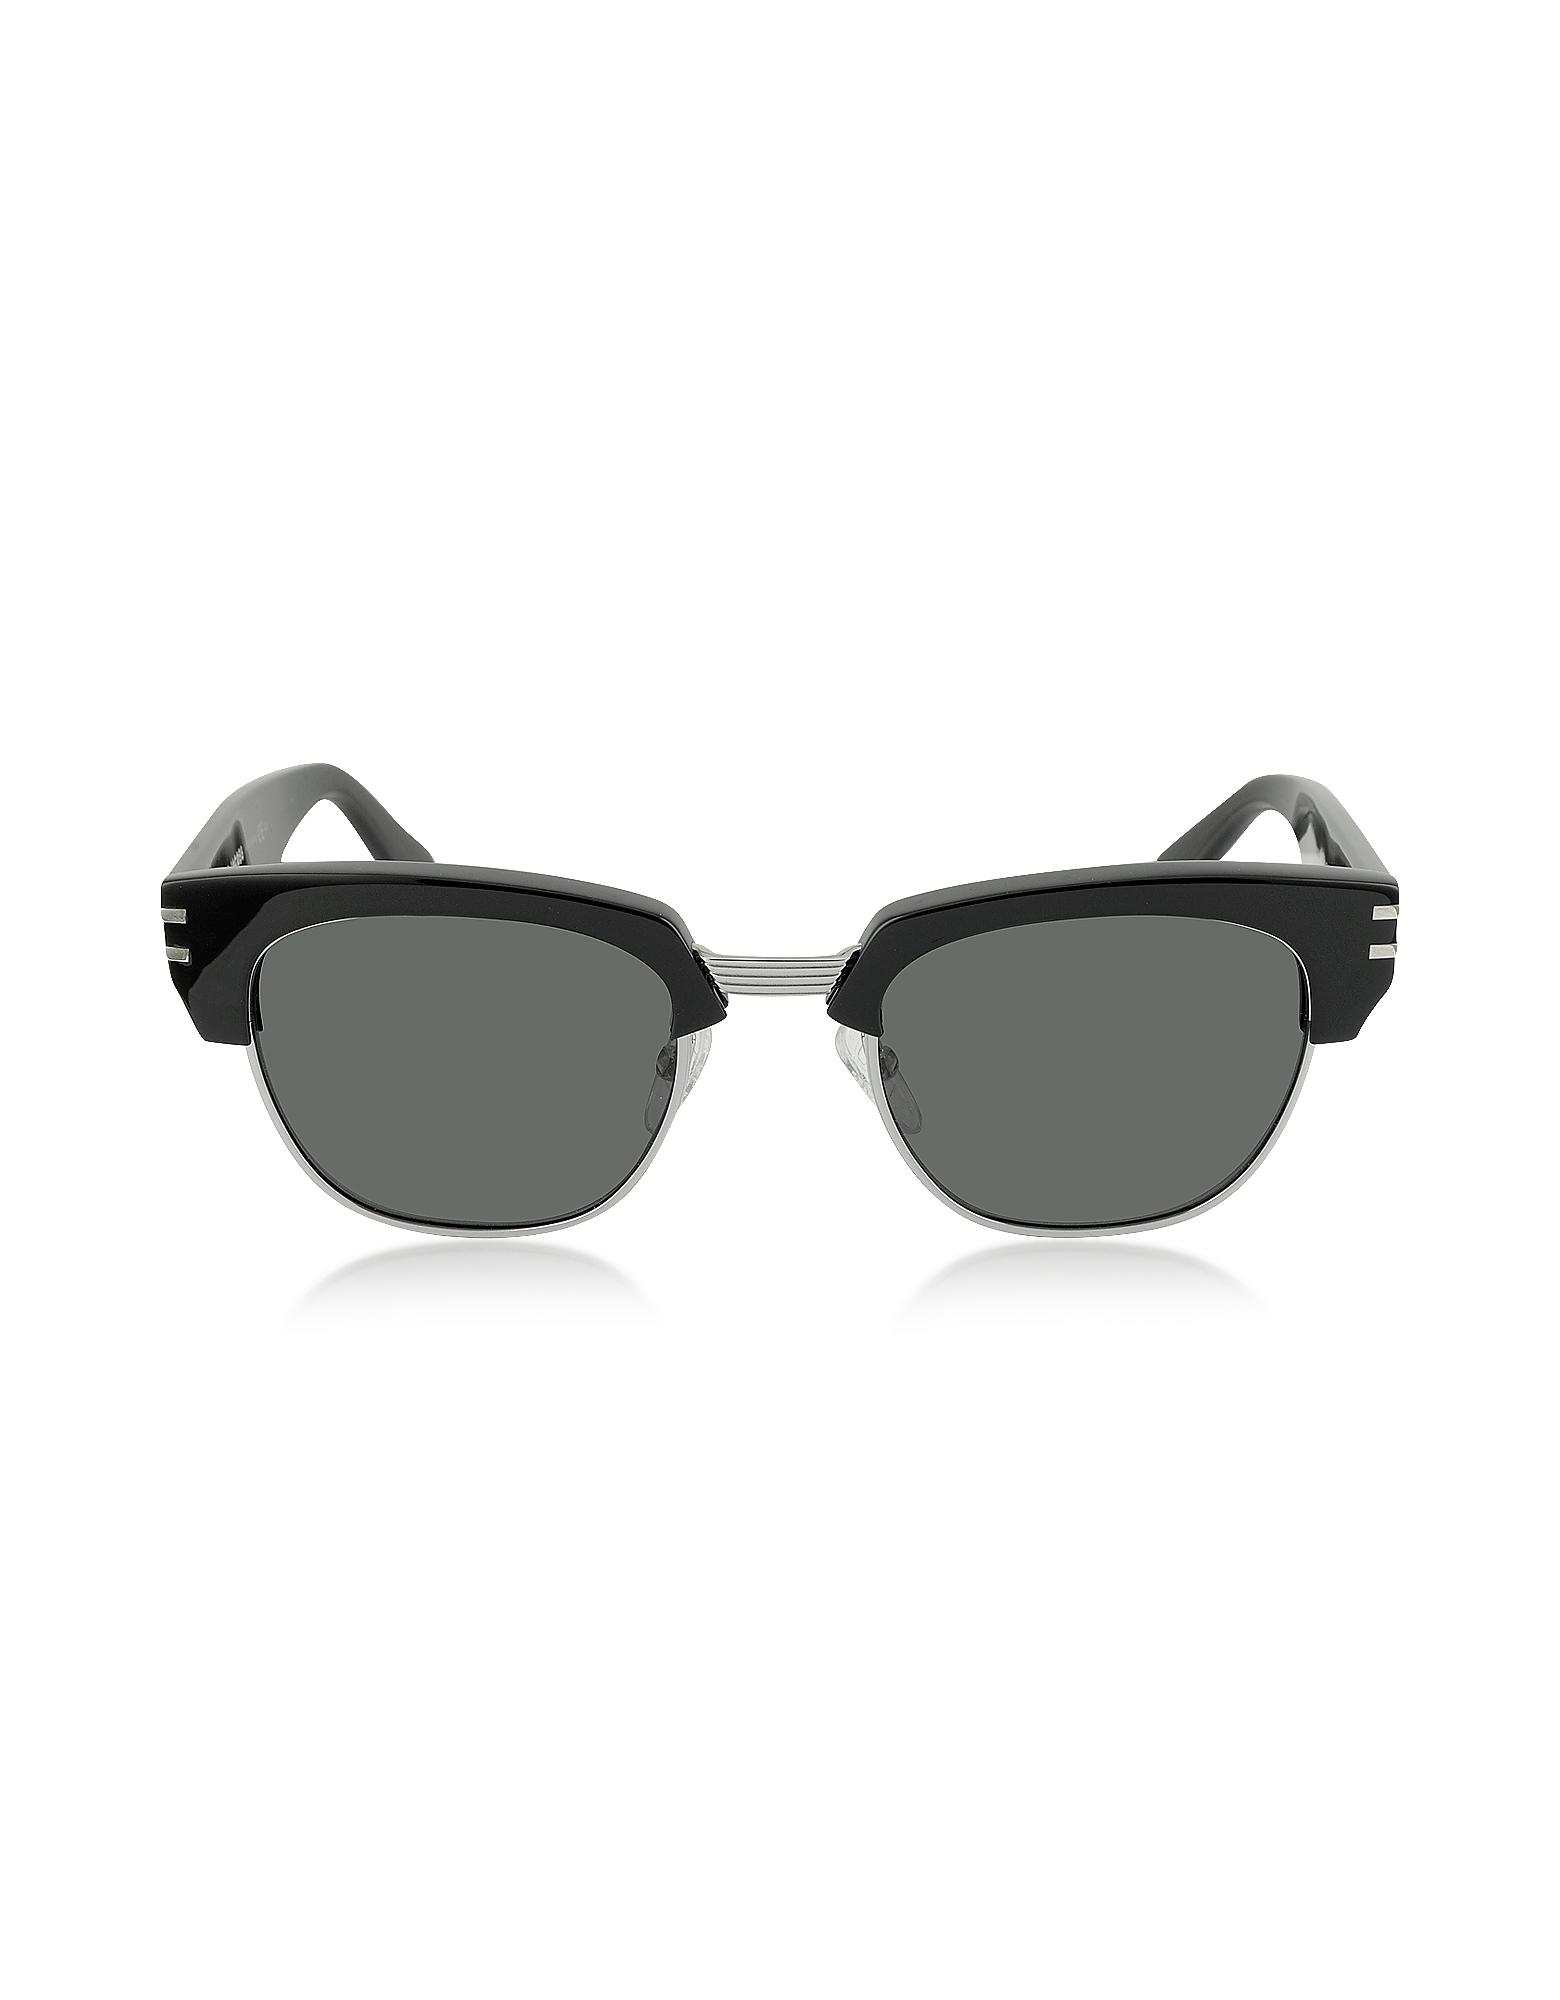 Marc Jacobs Designer Sunglasses, MJ 590/S Classic Browline Acetate Women's Sunglasses